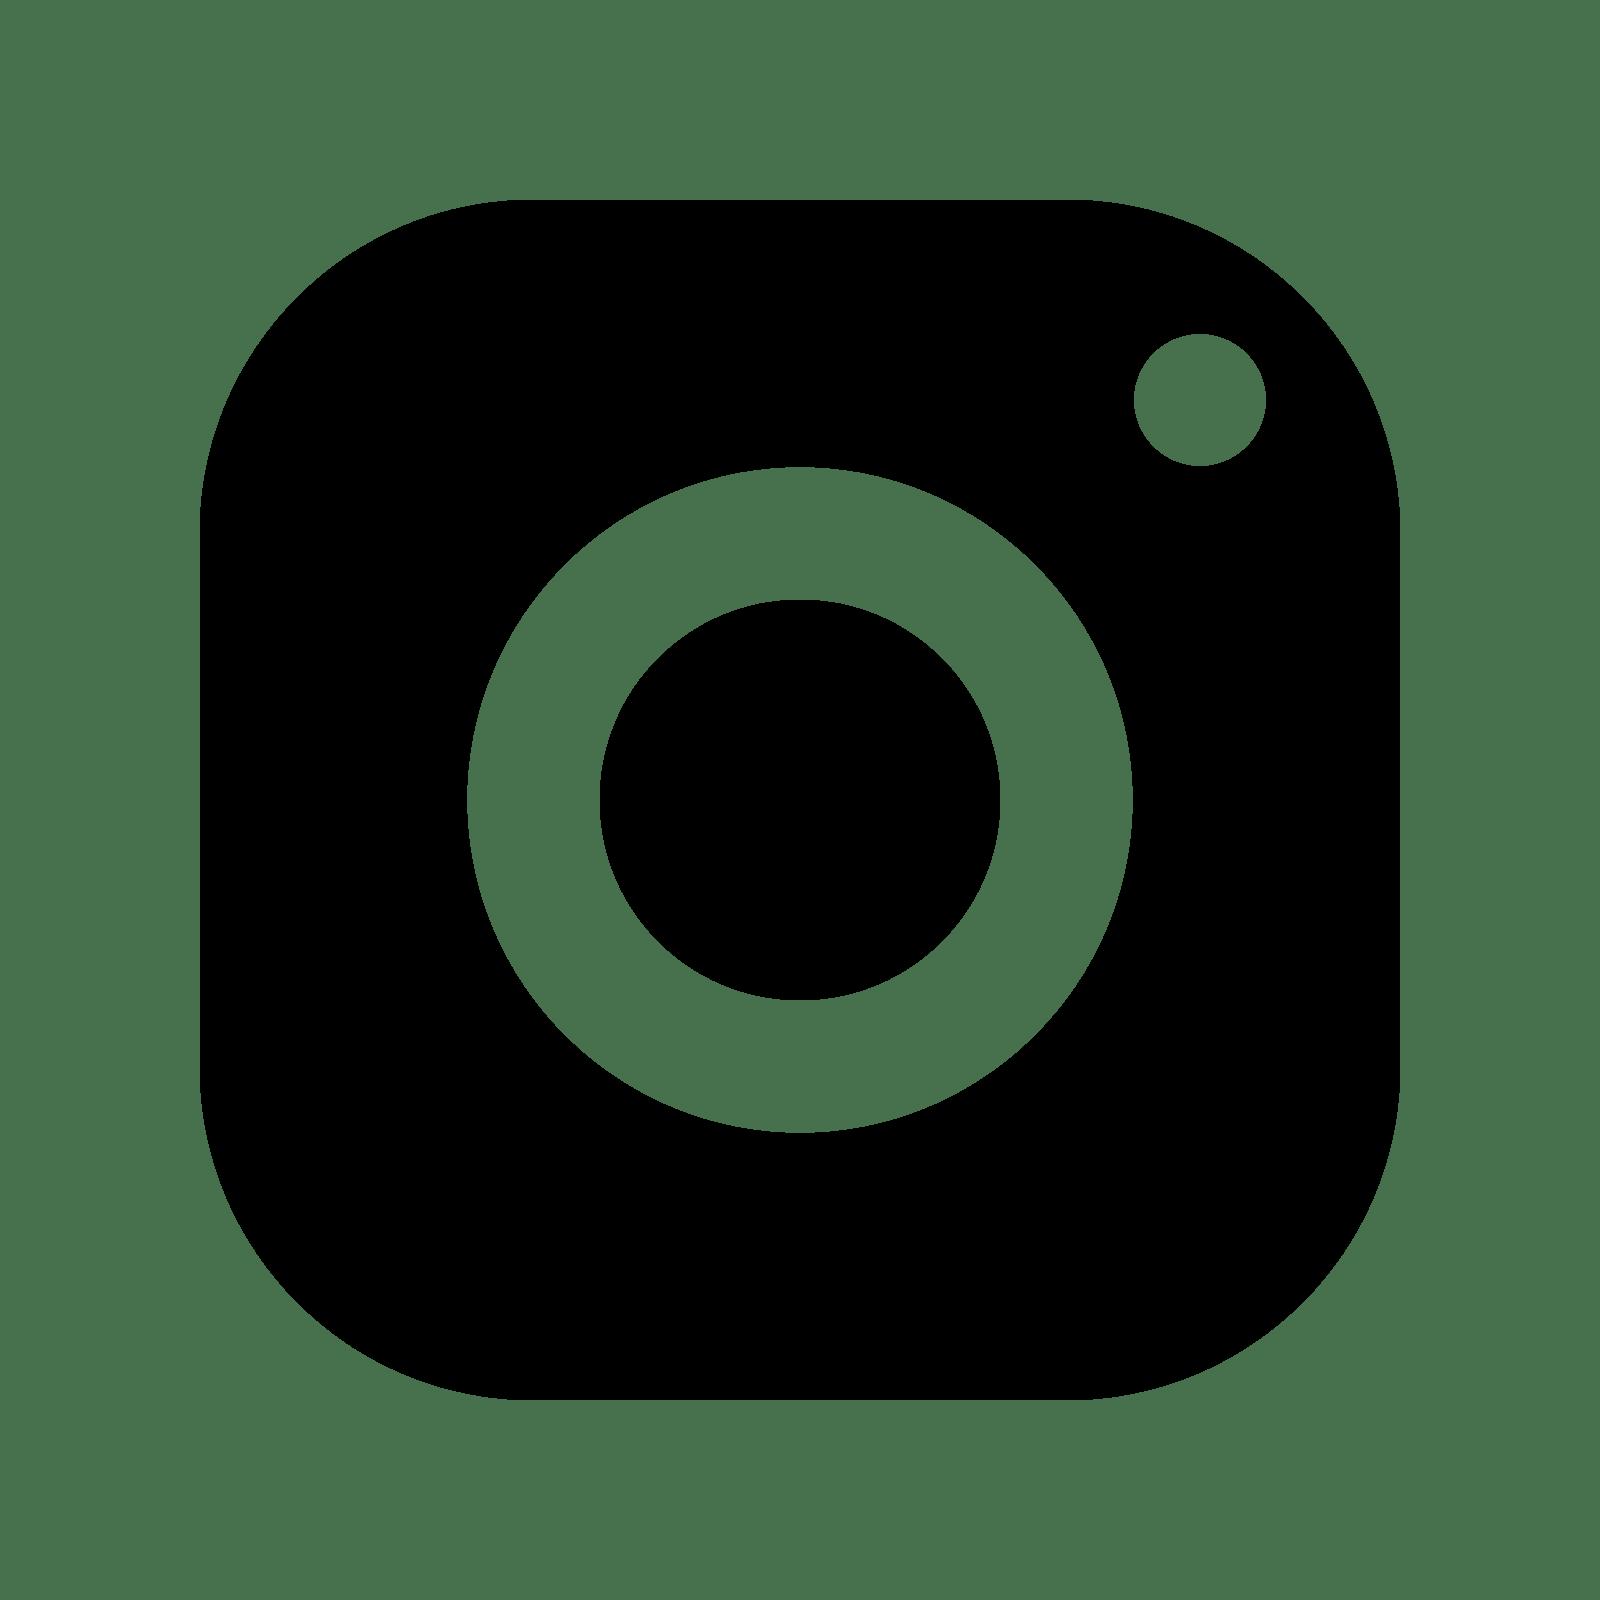 White Instagram Logo Vector at GetDrawings.com.